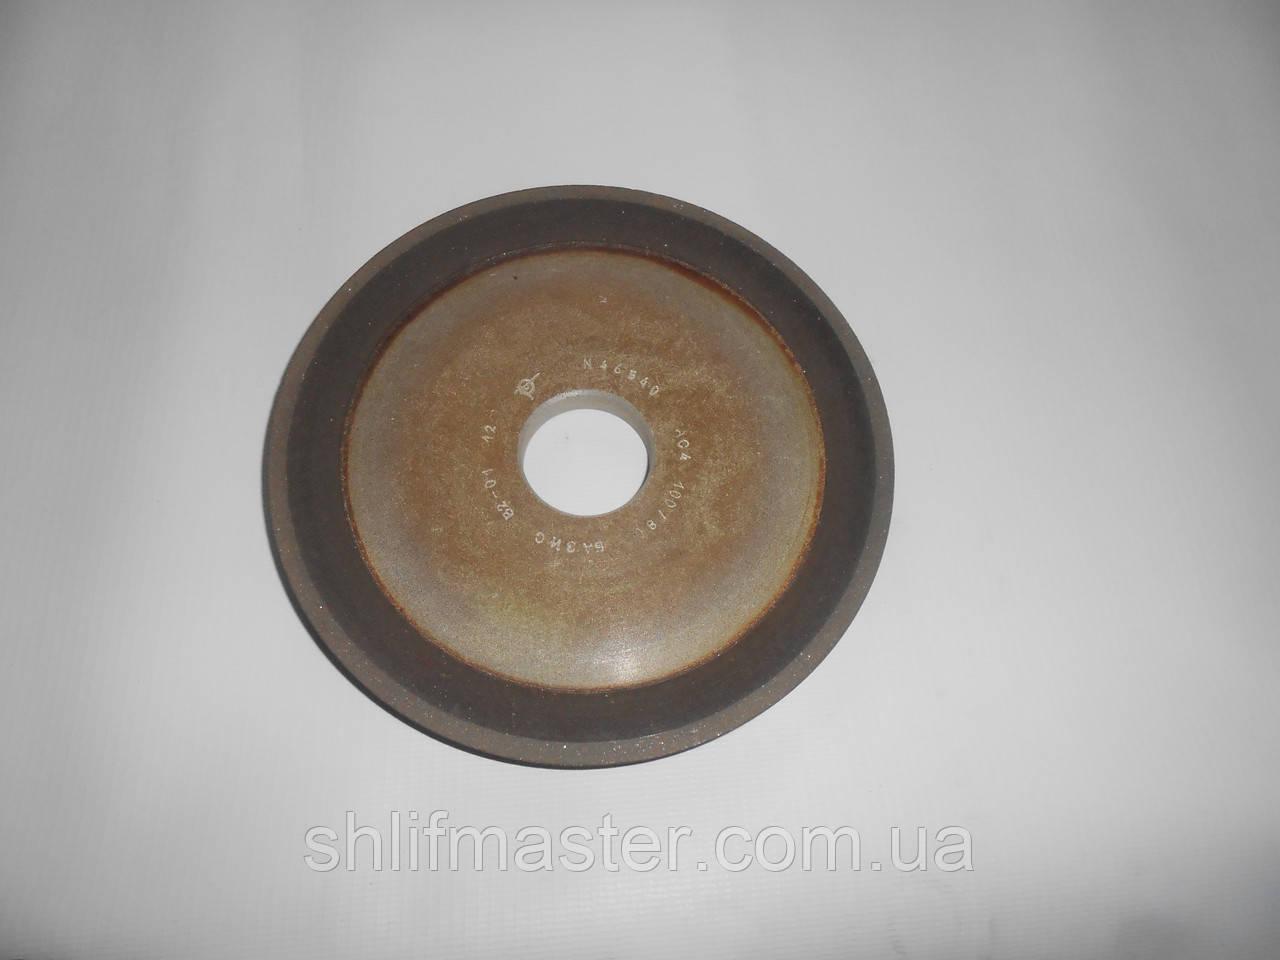 Круг алмазный шлифовальный ПП 200х10х3х76 БАЗИС зёрна:125/100;160/125